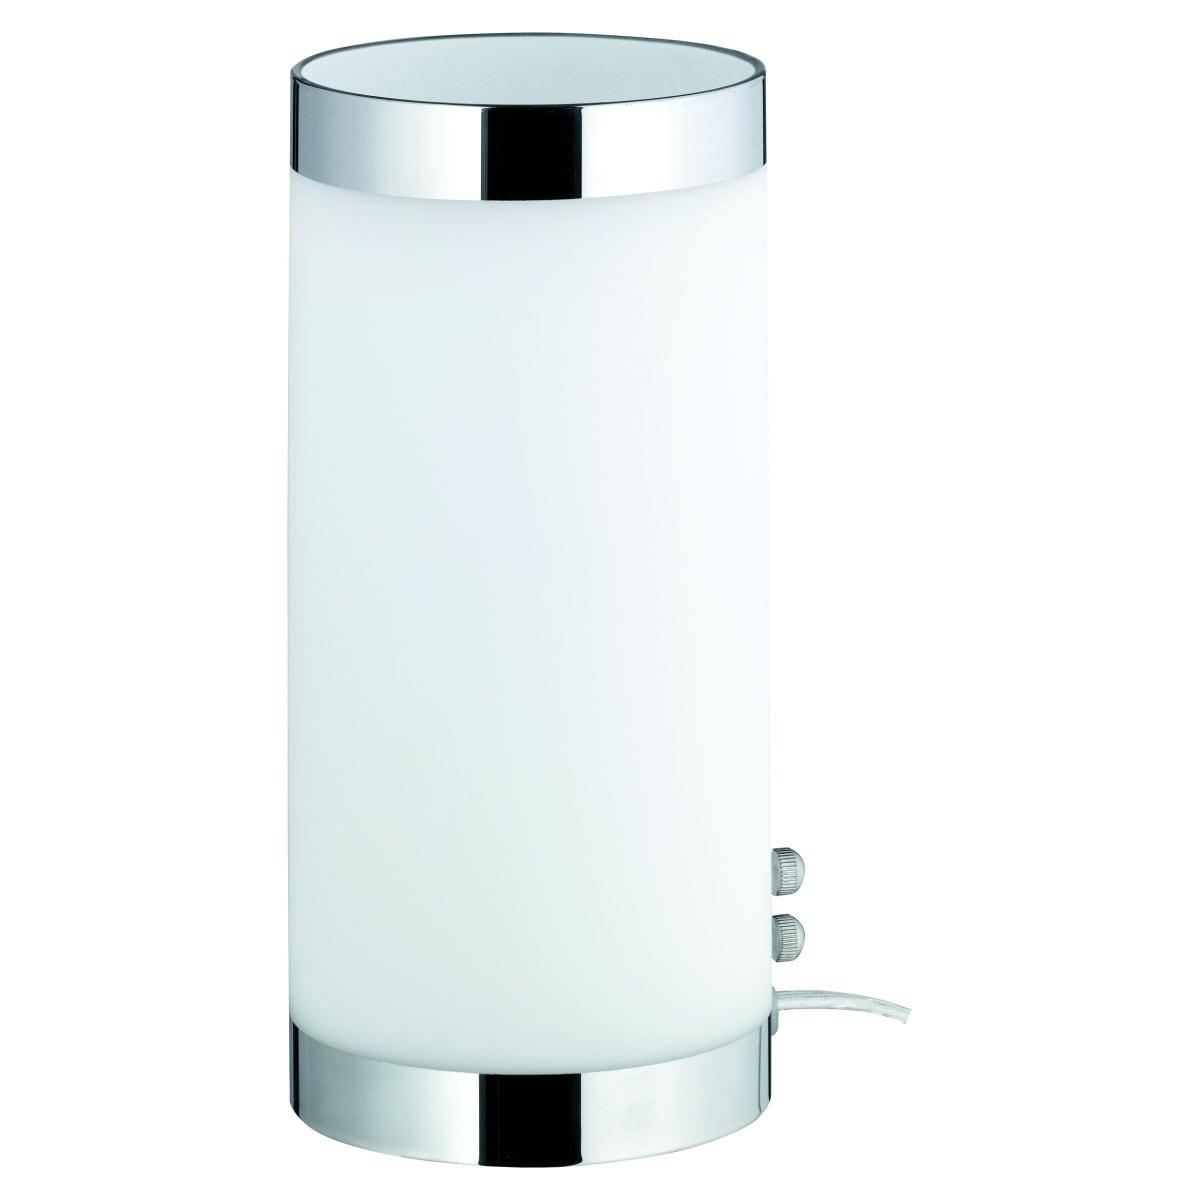 tischleuchte opalglas wei tischlampen lampen dekoration m bel boss. Black Bedroom Furniture Sets. Home Design Ideas